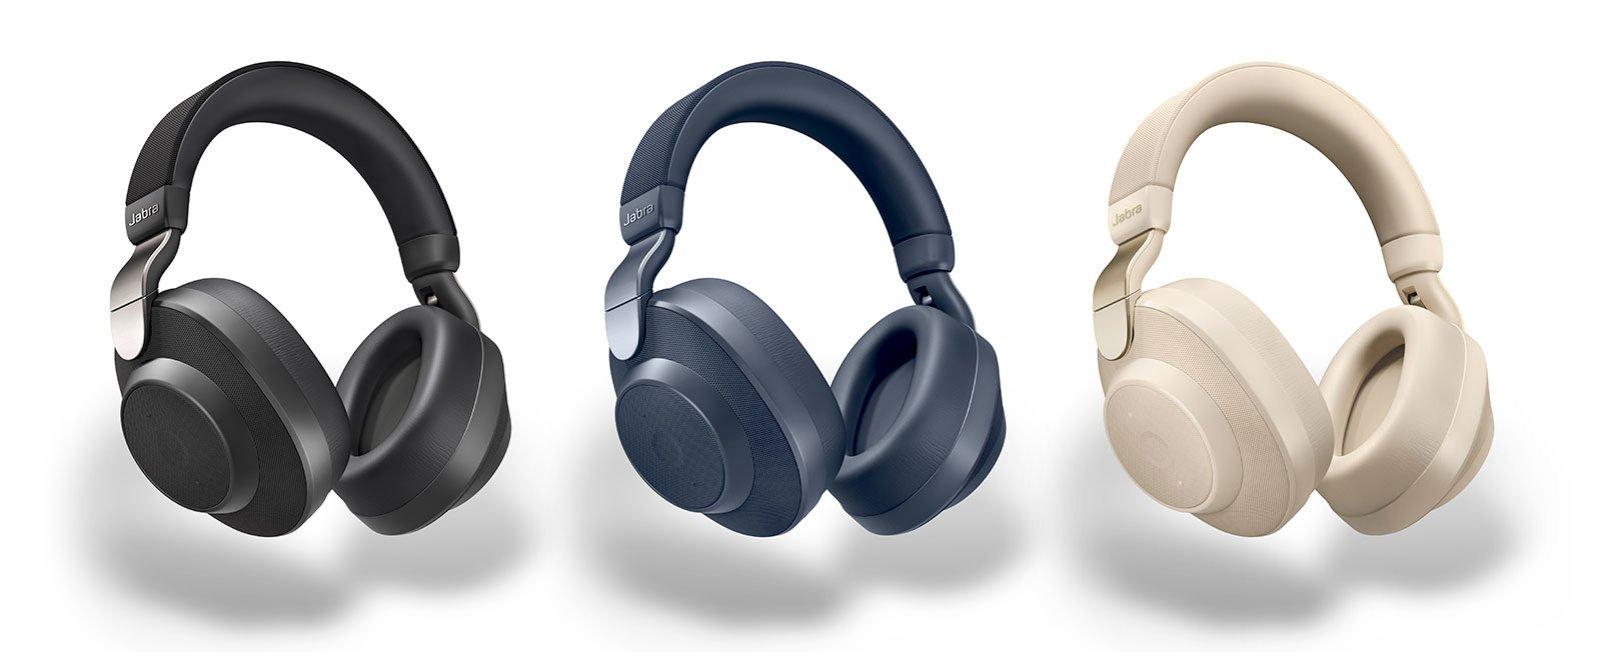 [CES 2019] Sennheiser Perkenalkan Speaker Pertamanya untuk Rumahan, Ambeo Soundbar 24 Ears In Heaven